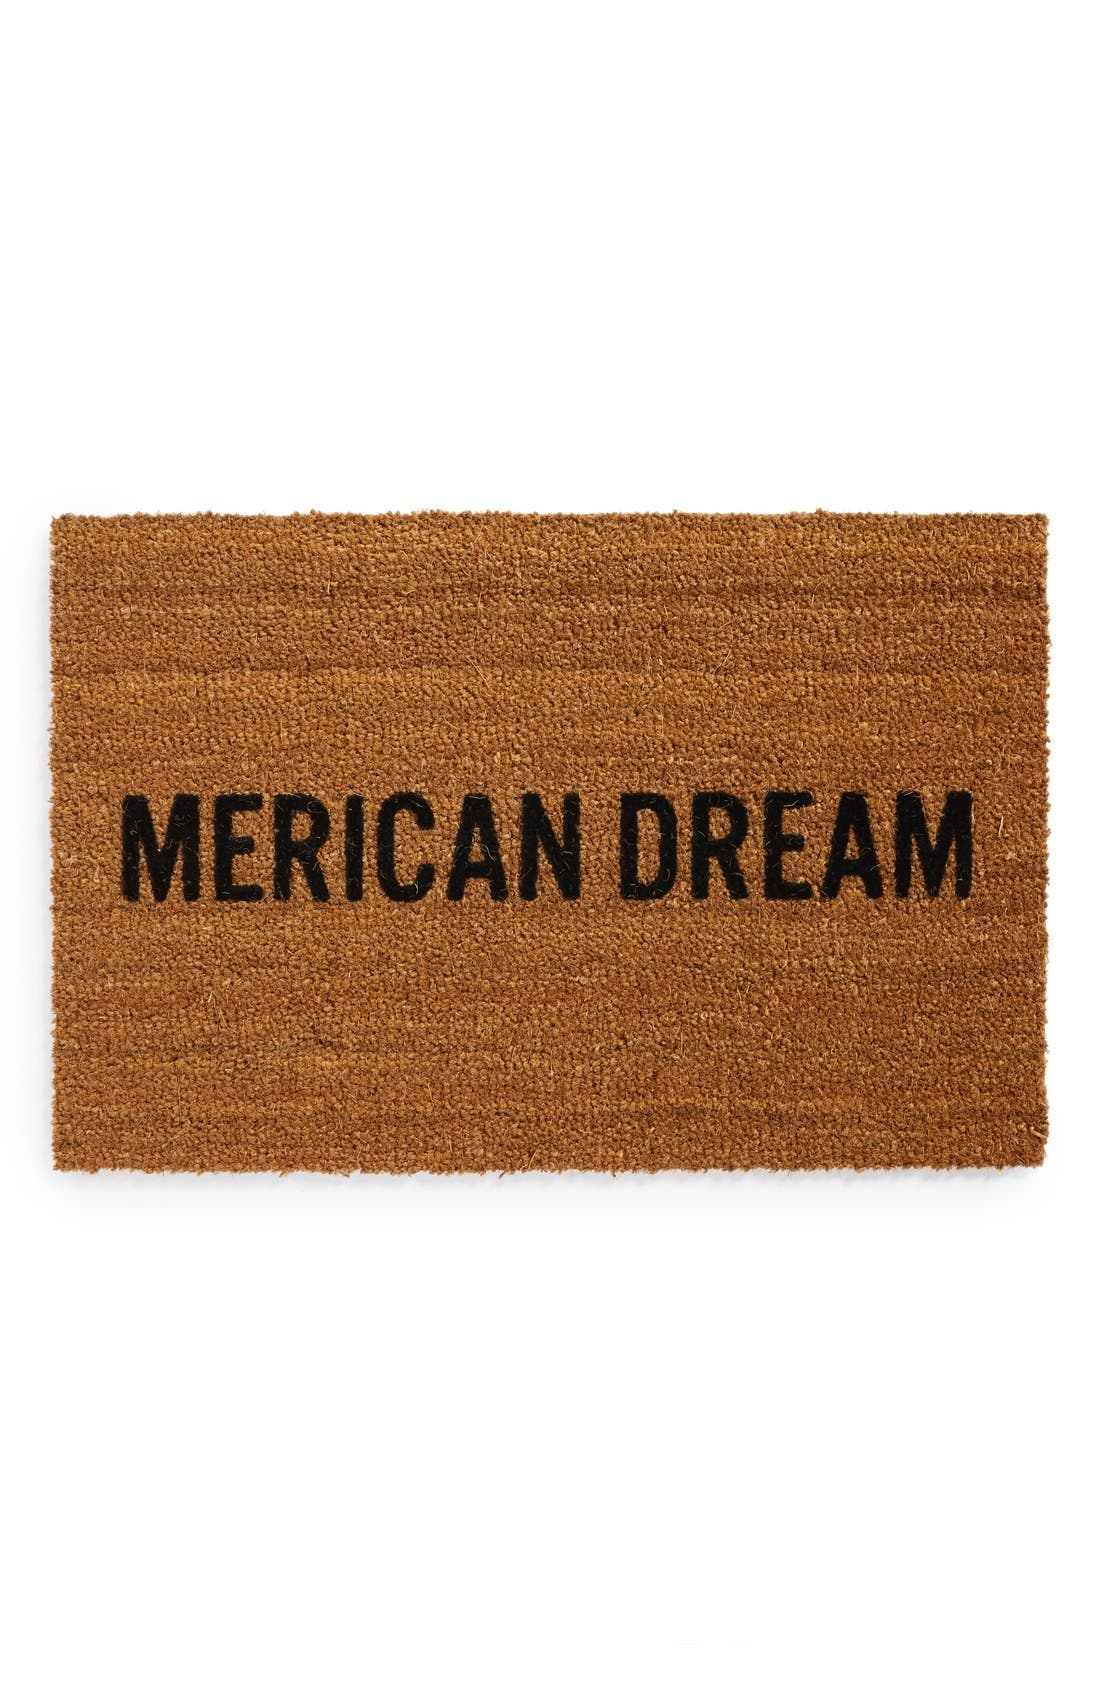 Alternate Image 1 Selected - Reed Wilson Design 'Merican Dream' Doormat